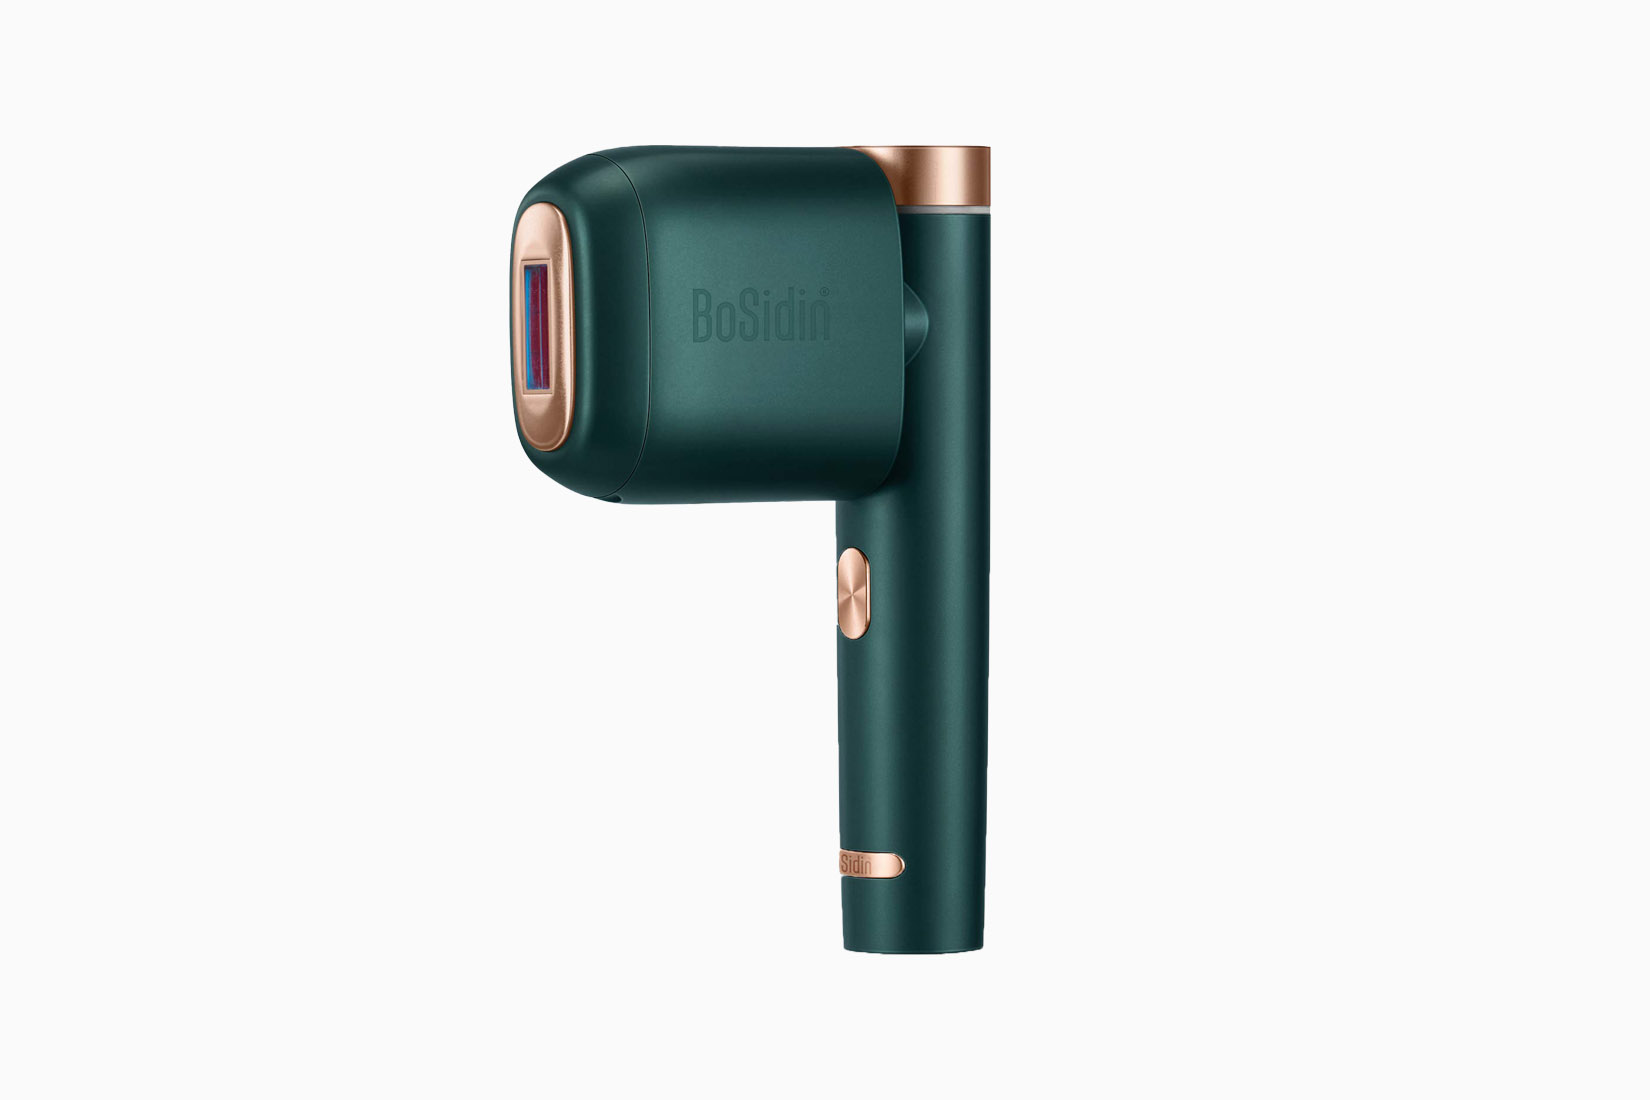 best ipl hair removal bosidin review Luxe Digital